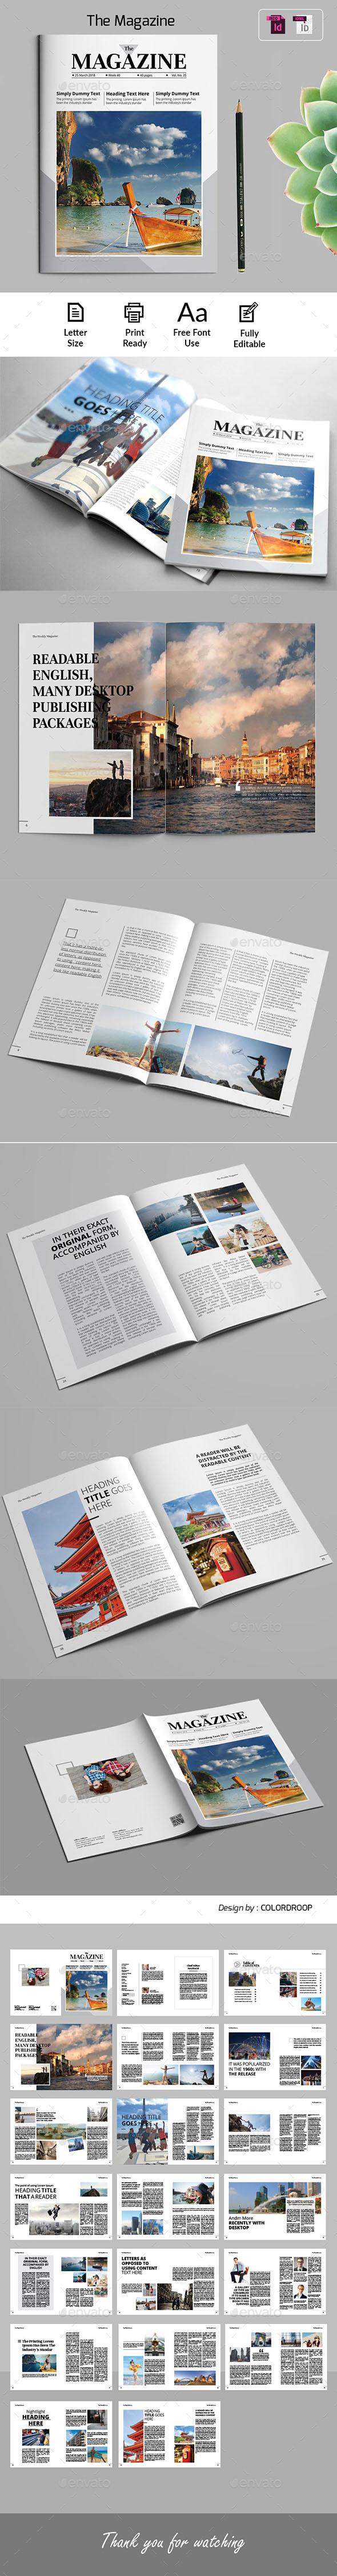 The Weekly Magazine - Magazines Print Templates